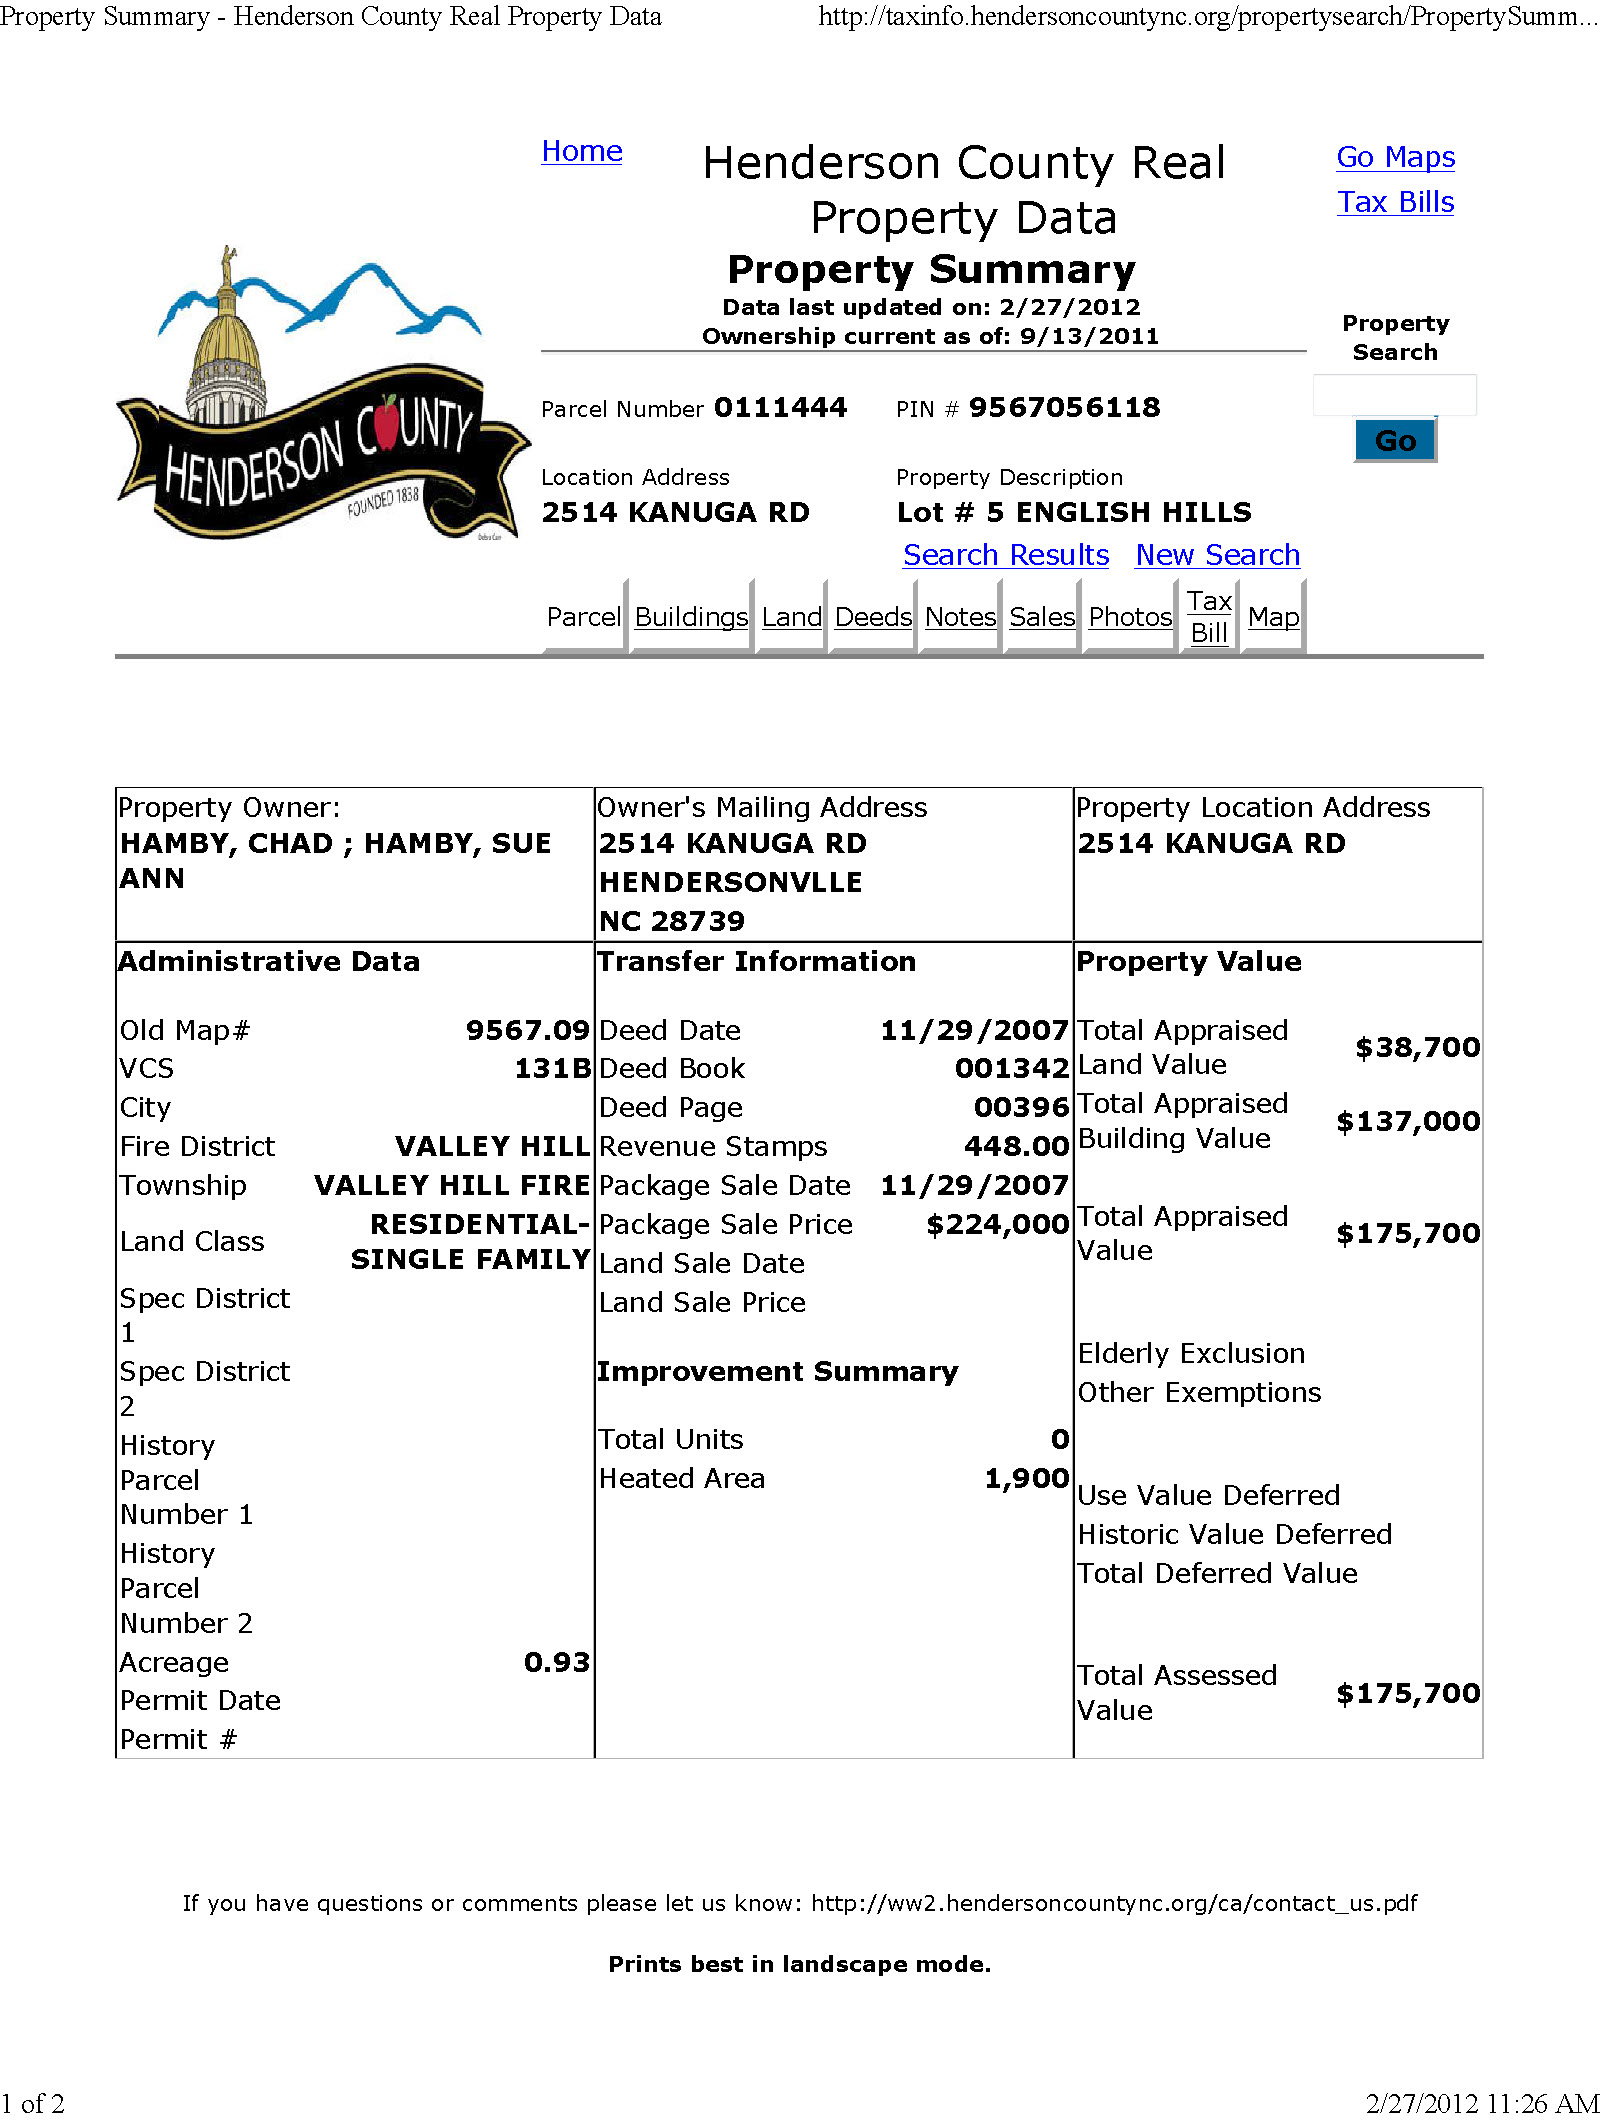 Copy of hamby chadwick jerry property tax info1.jpg